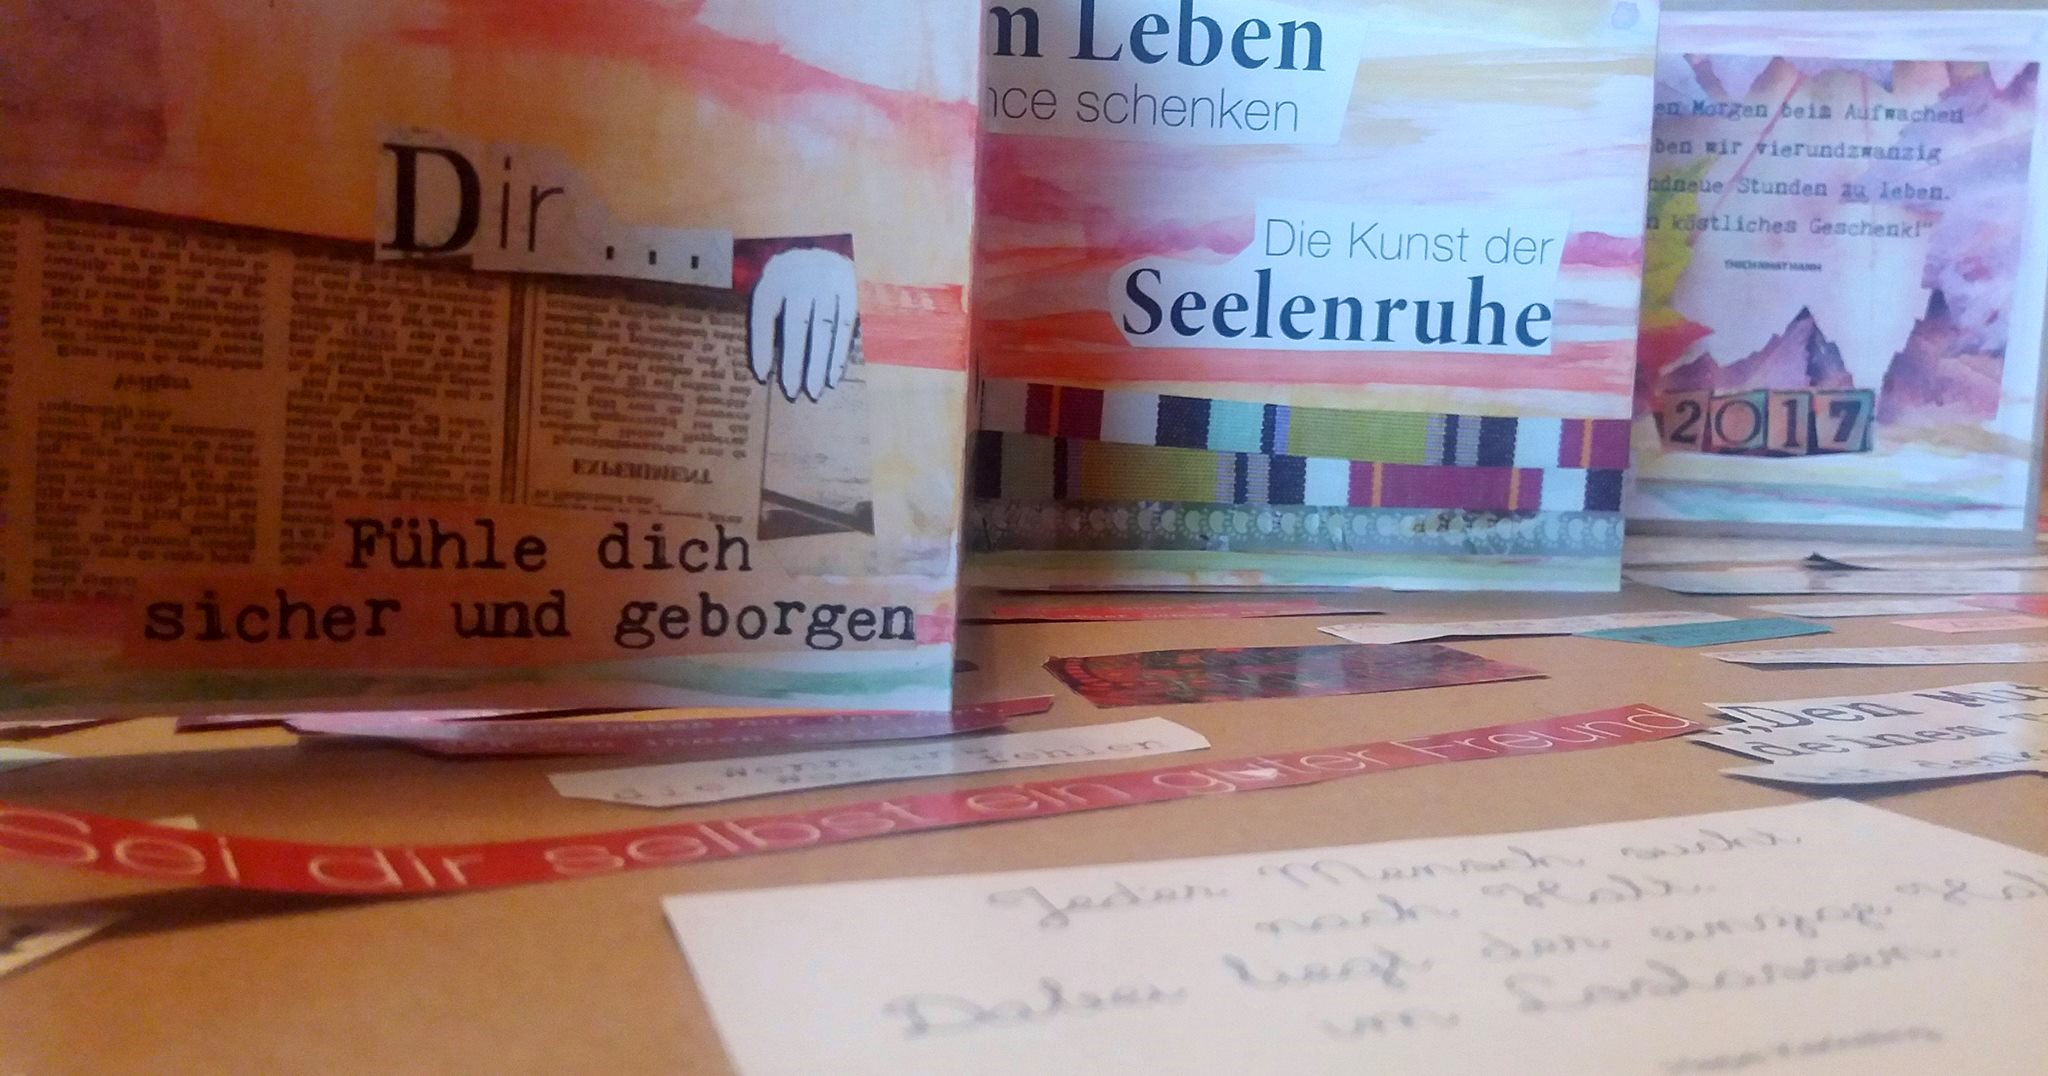 Neue Wege - Sandra Reekers, Dranbleib Coach